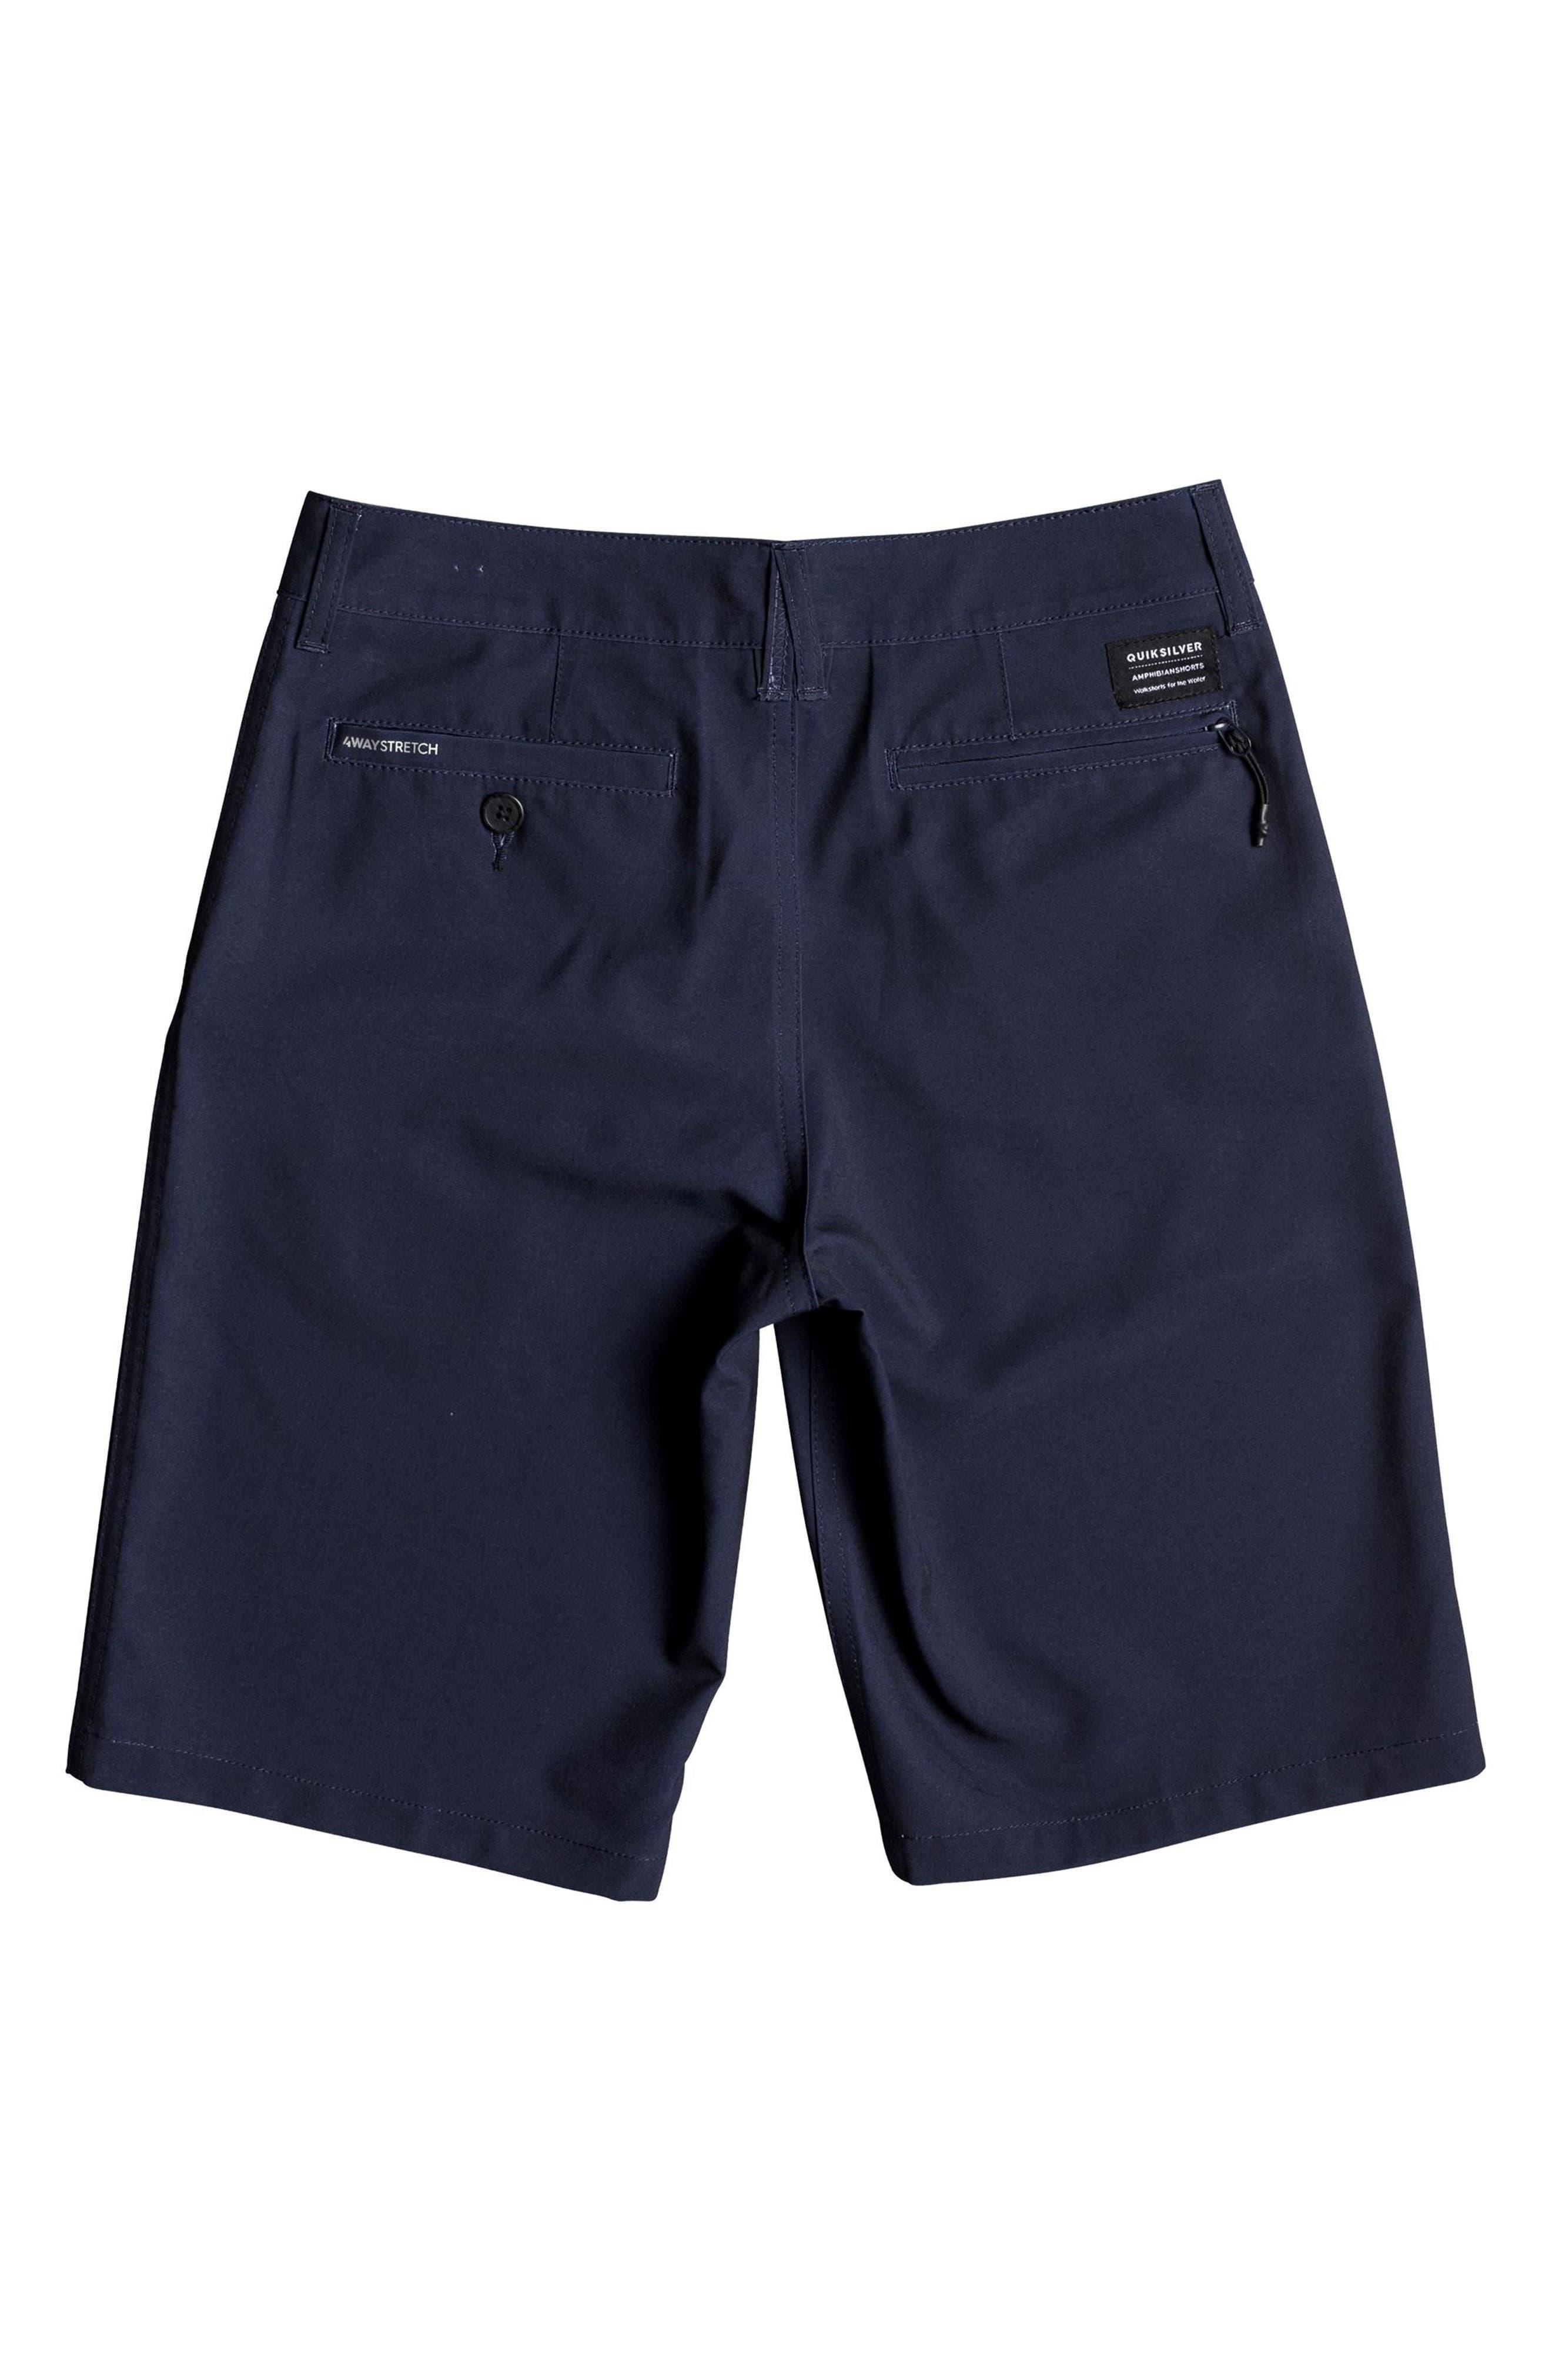 Union Amphibian Hybrid Shorts,                             Alternate thumbnail 2, color,                             Navy Blazer